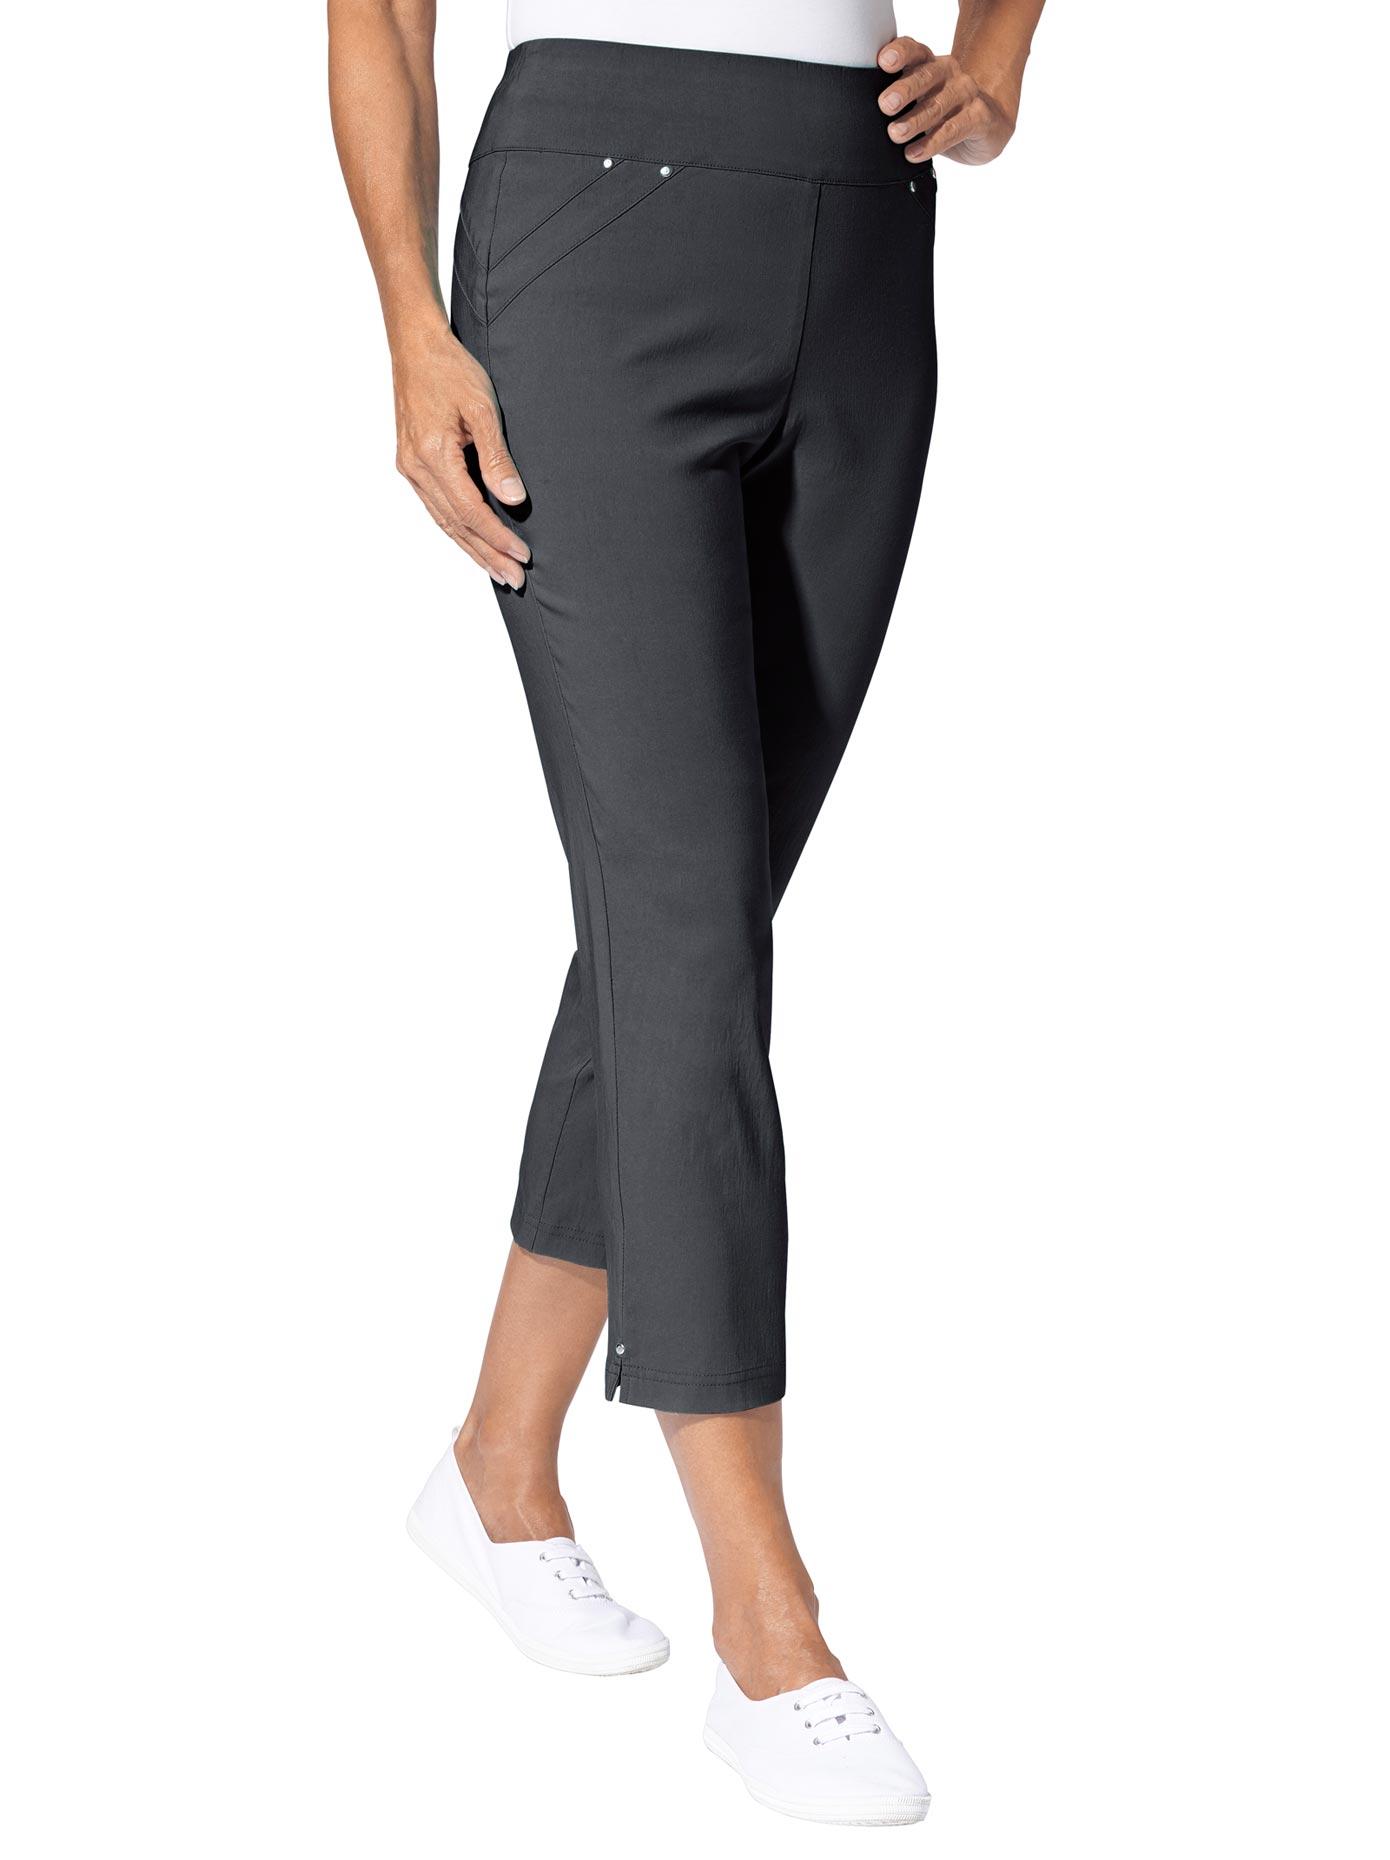 Classic Basics 7/8-Hose mit breitem Bund | Bekleidung > Hosen > 7/8-Hosen | Classic Basics